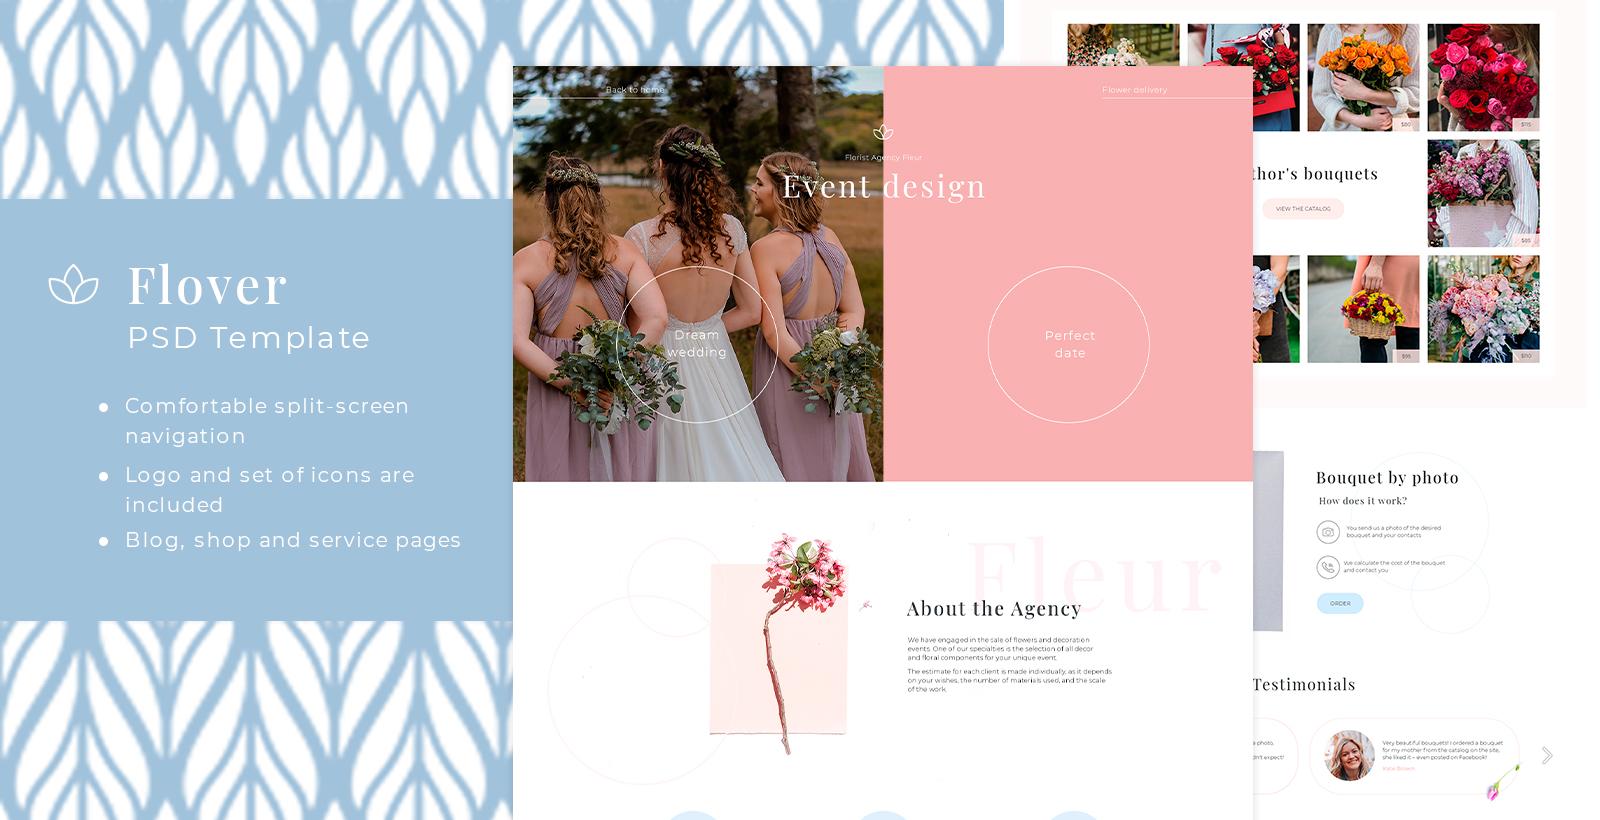 Flover - Flower Shop and Event Design PSD PSD Template